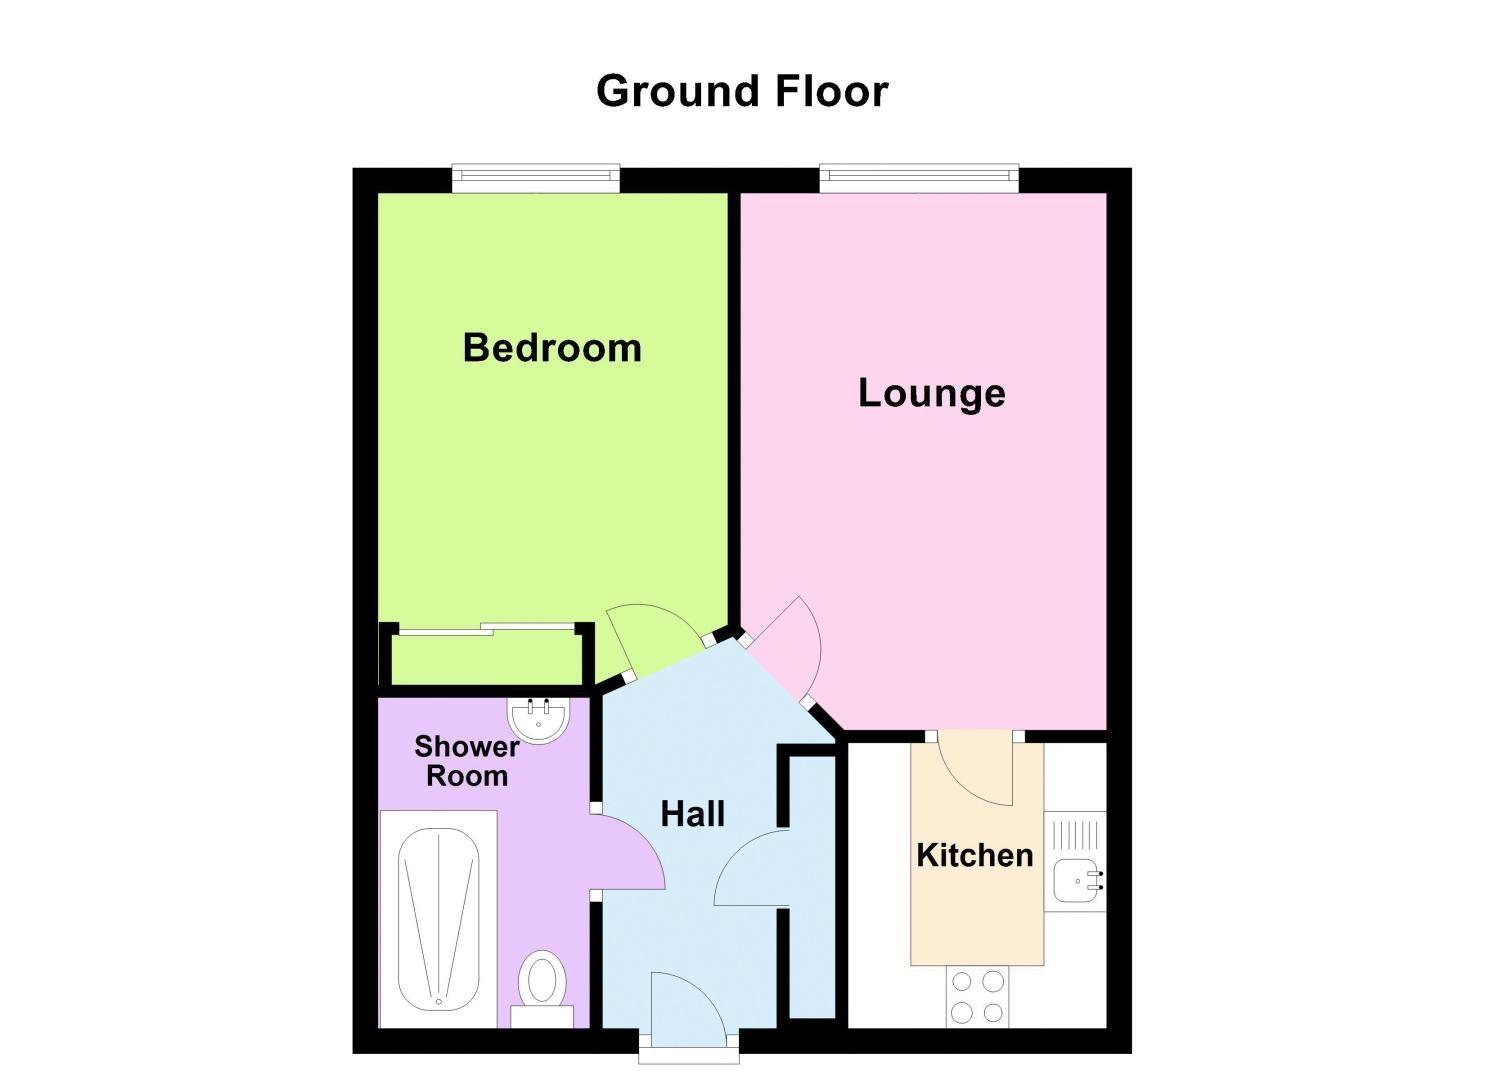 1 bed  for sale in Quinton Lane - Property Floorplan